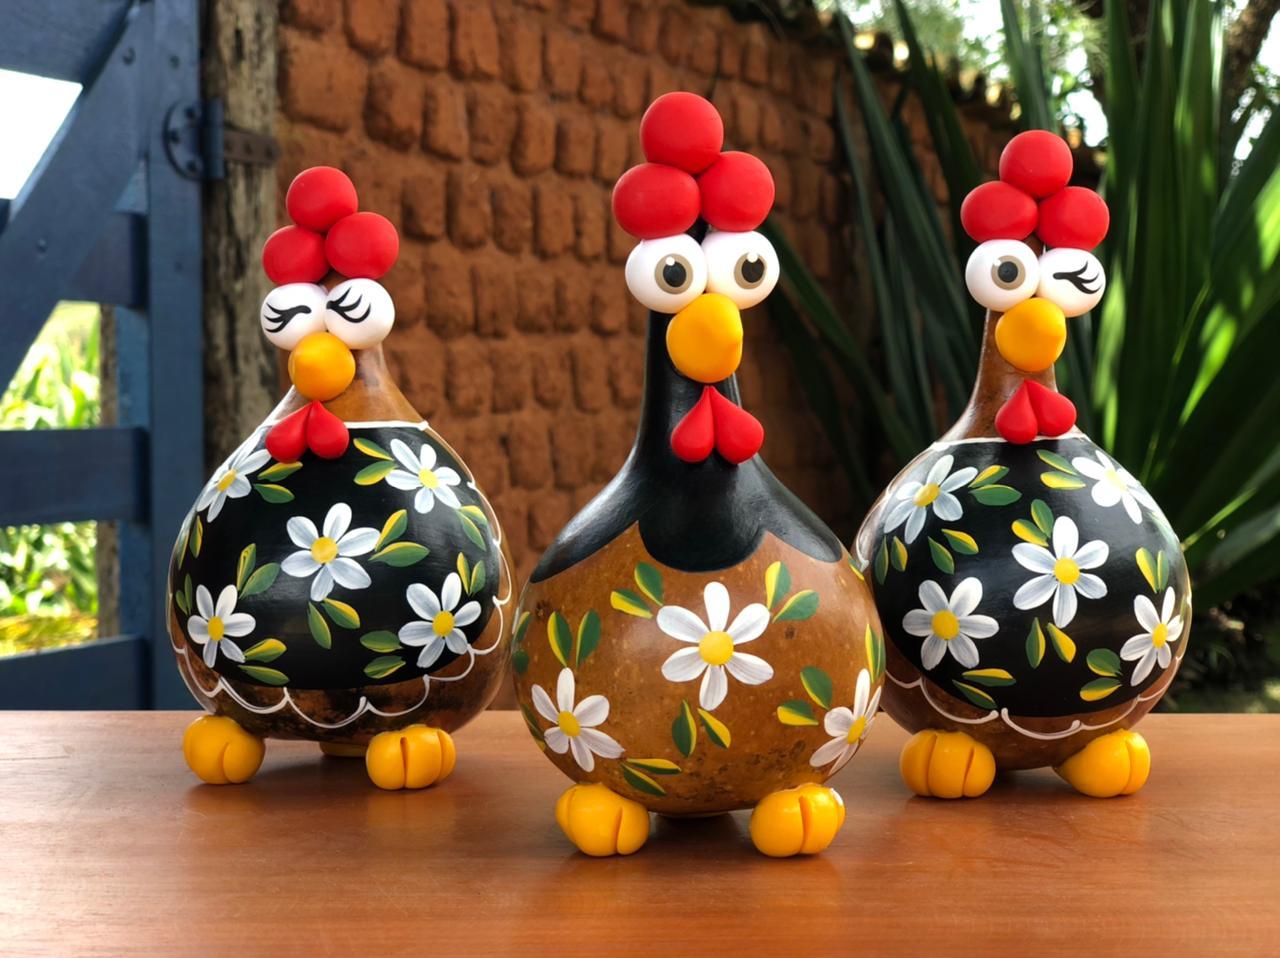 Kit Galinha Rustica De Cabaça Artesanal floral